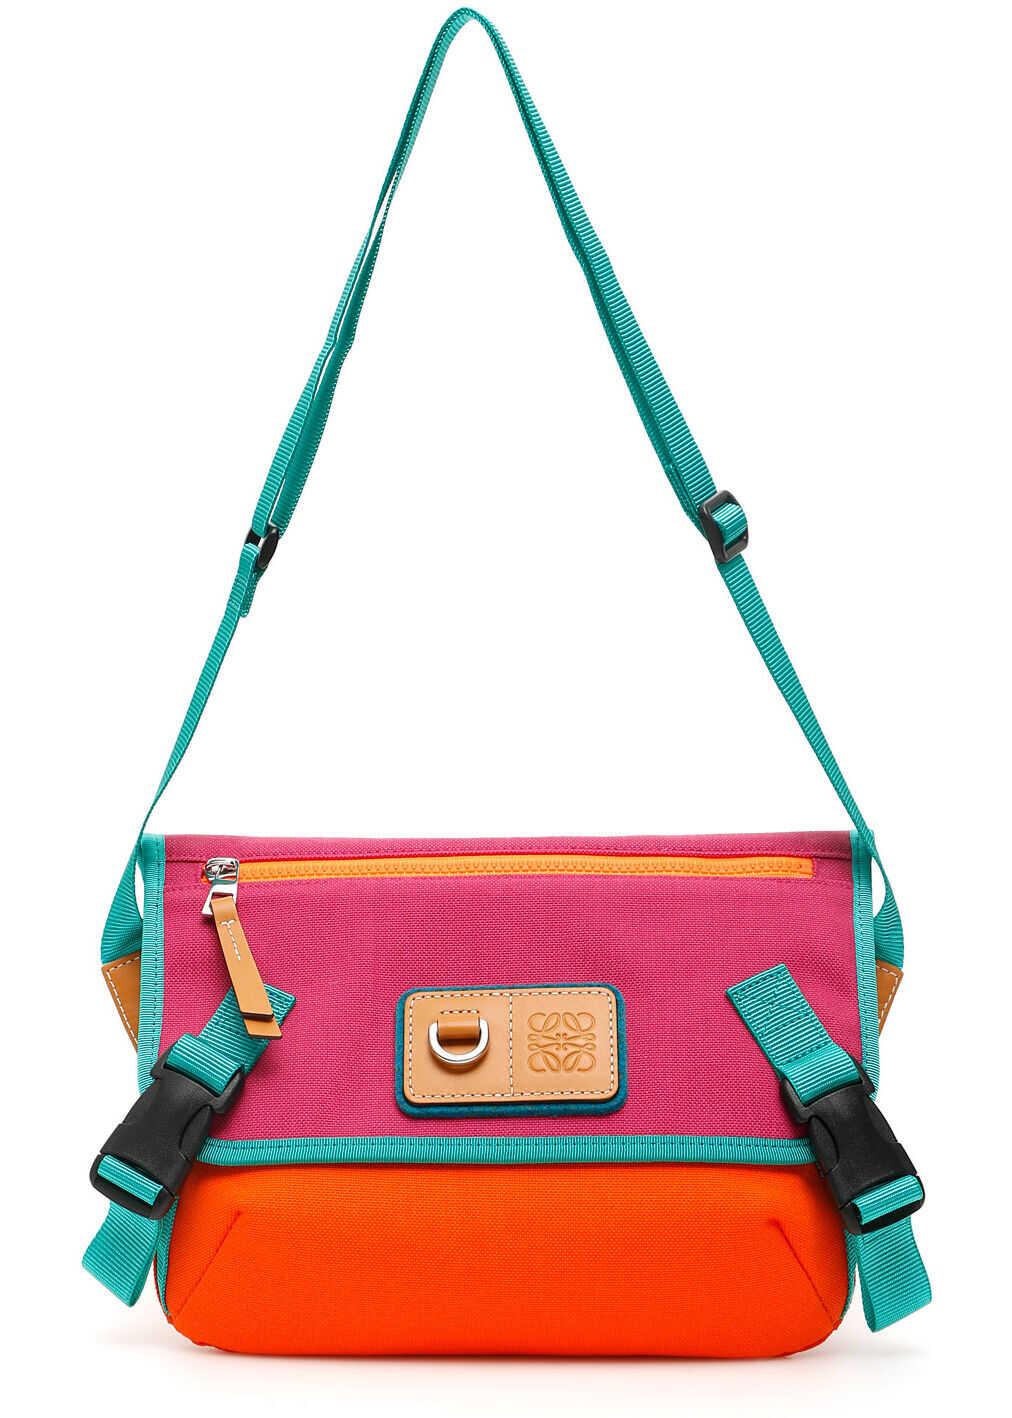 Loewe Eye Nature Messenger Bag 30150AB55 VIOLET ORANGE imagine b-mall.ro